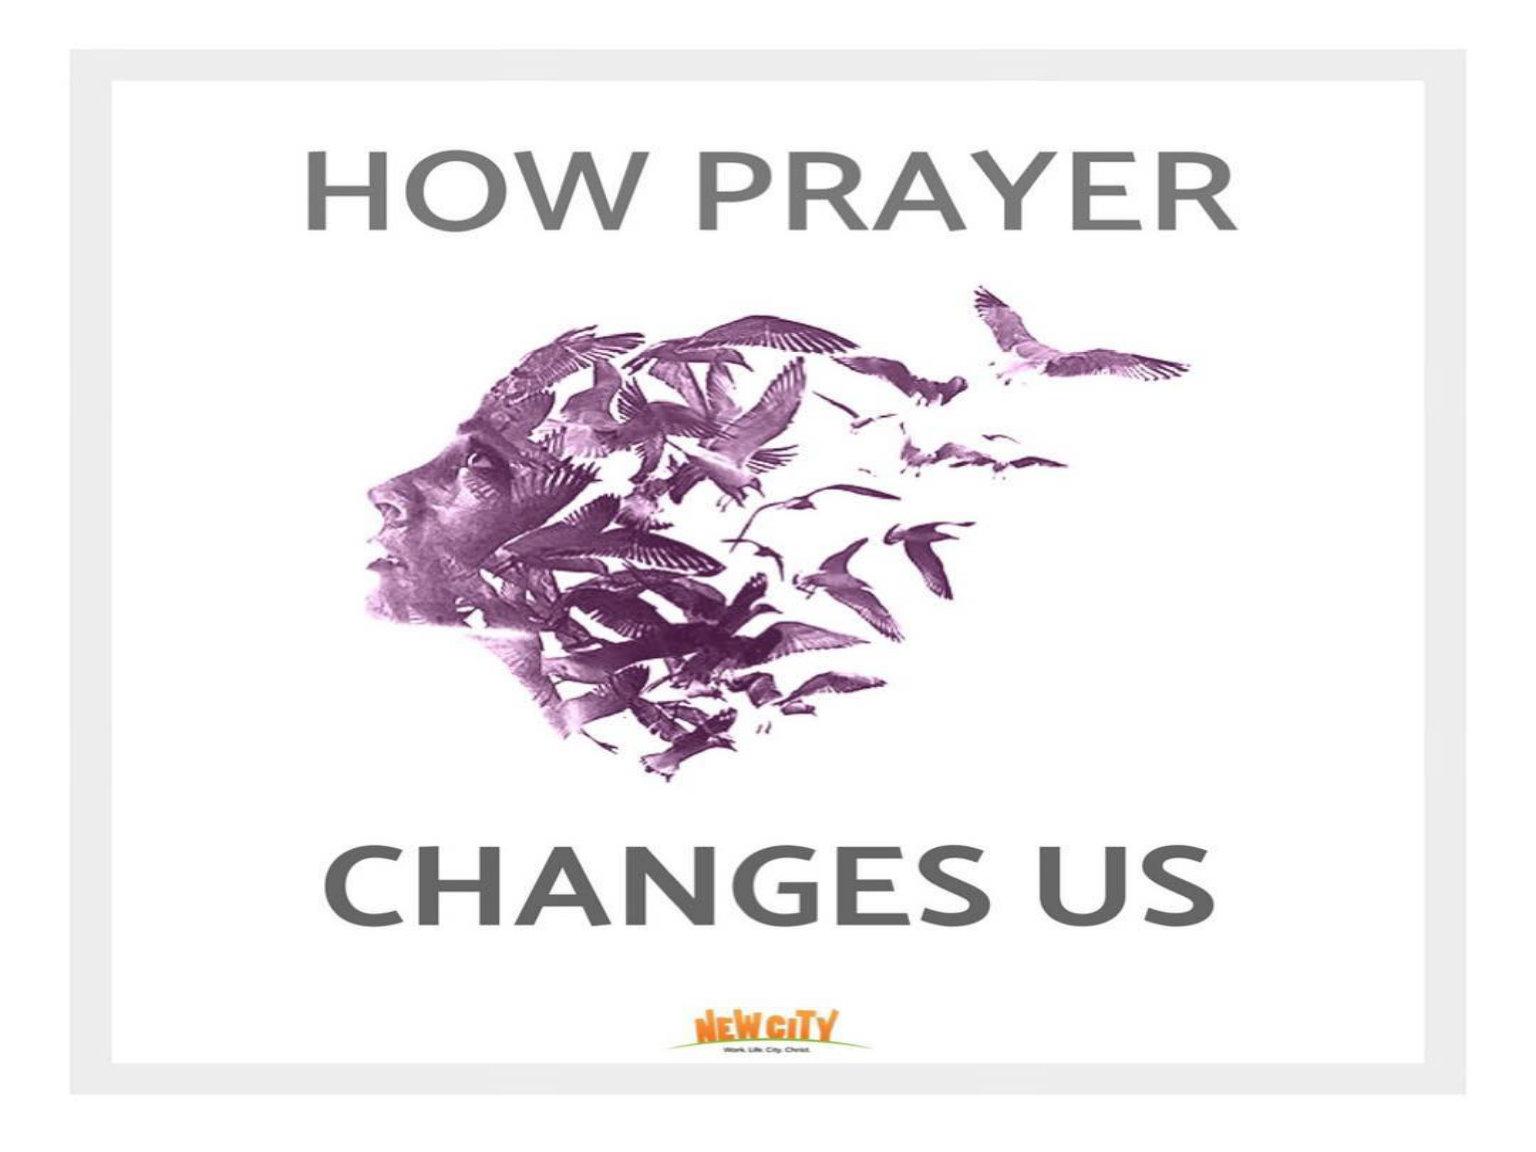 How Prayer Changes Us - Cindrella Prakash Asher Image